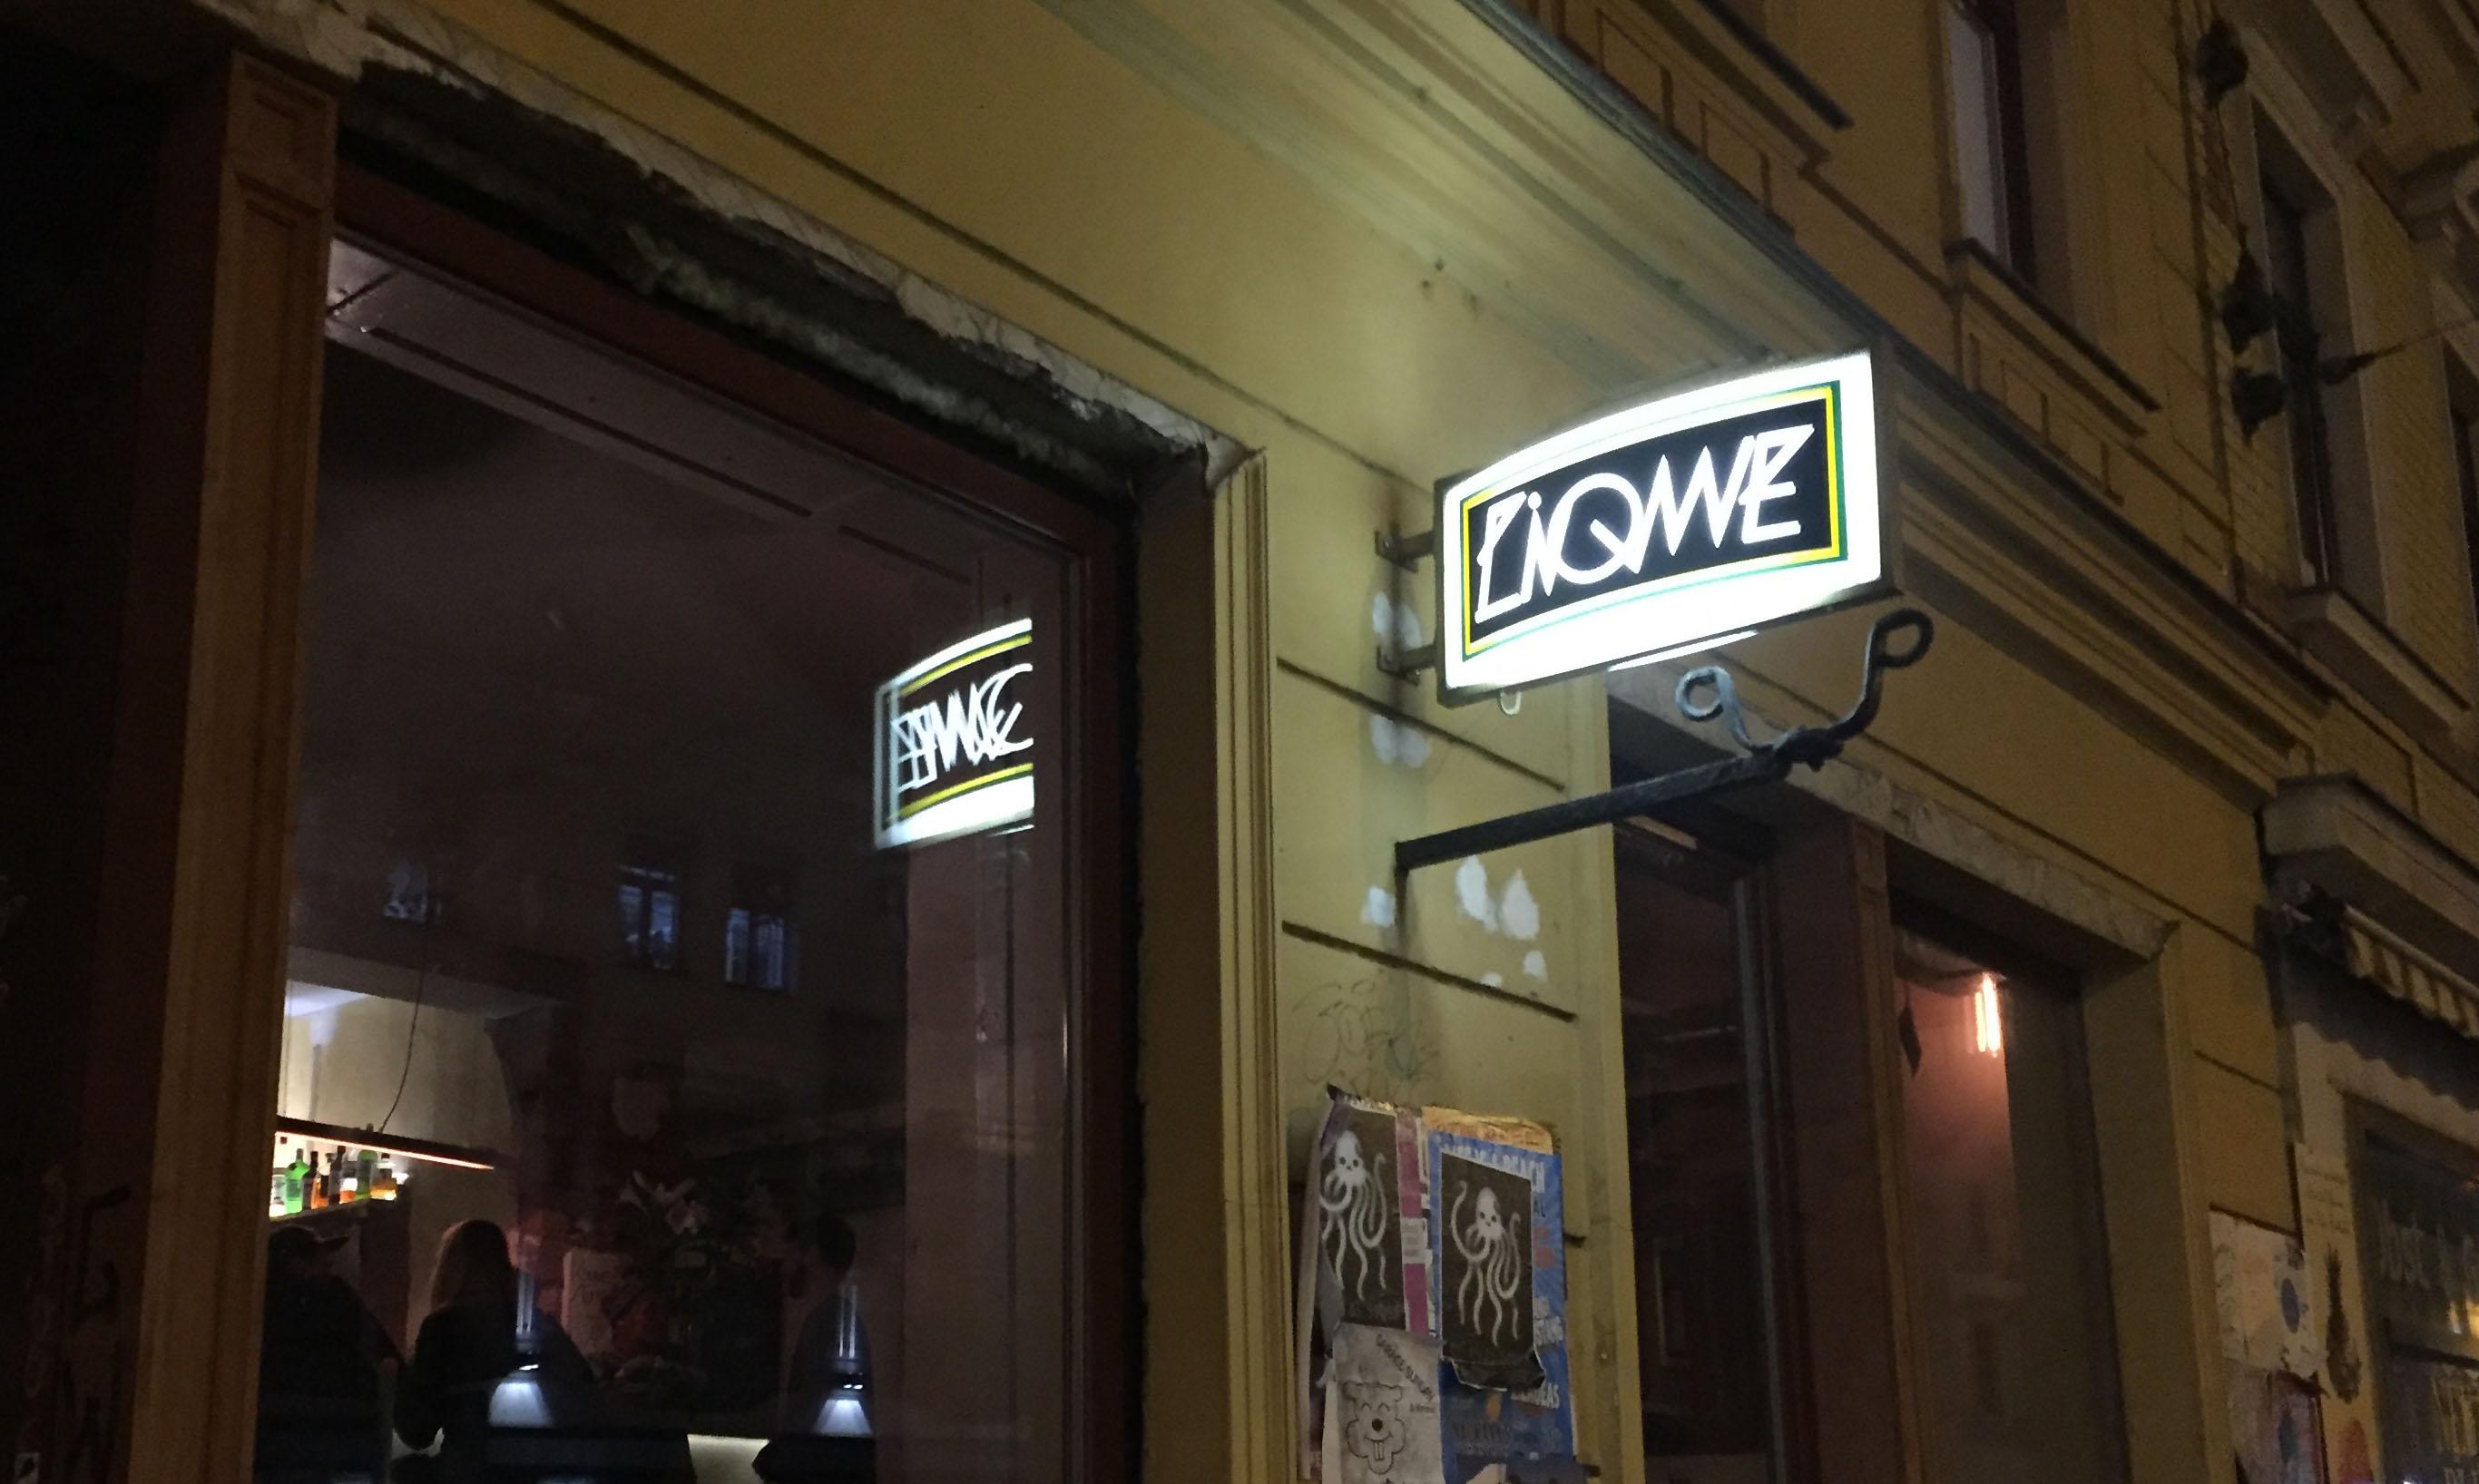 Liqwe from inside